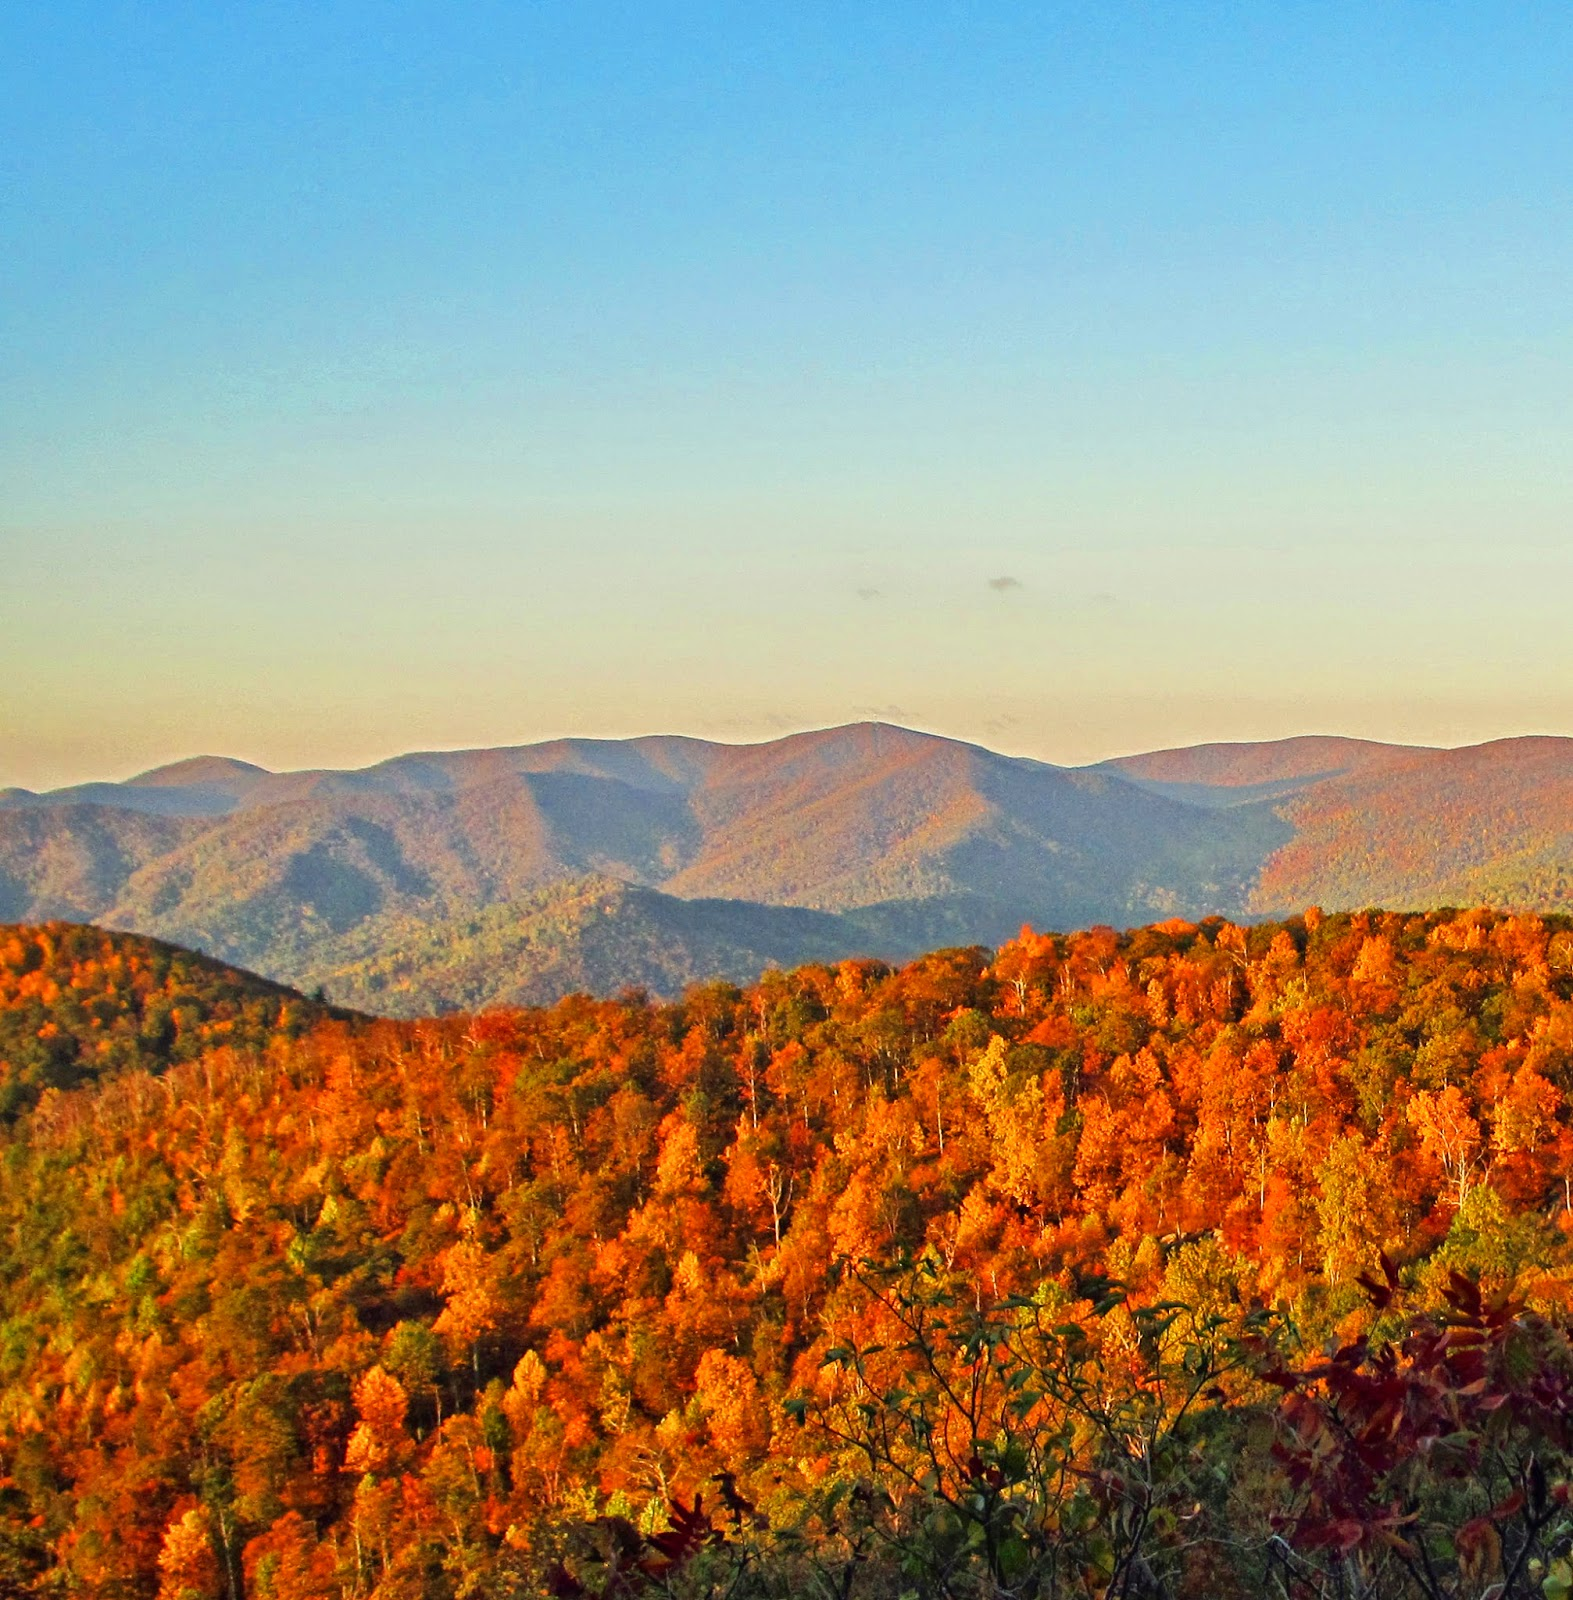 Hiking Old Rag Tips: Old Rag Mountain Hikes/Patrols By RSL: Peak Leaf Color